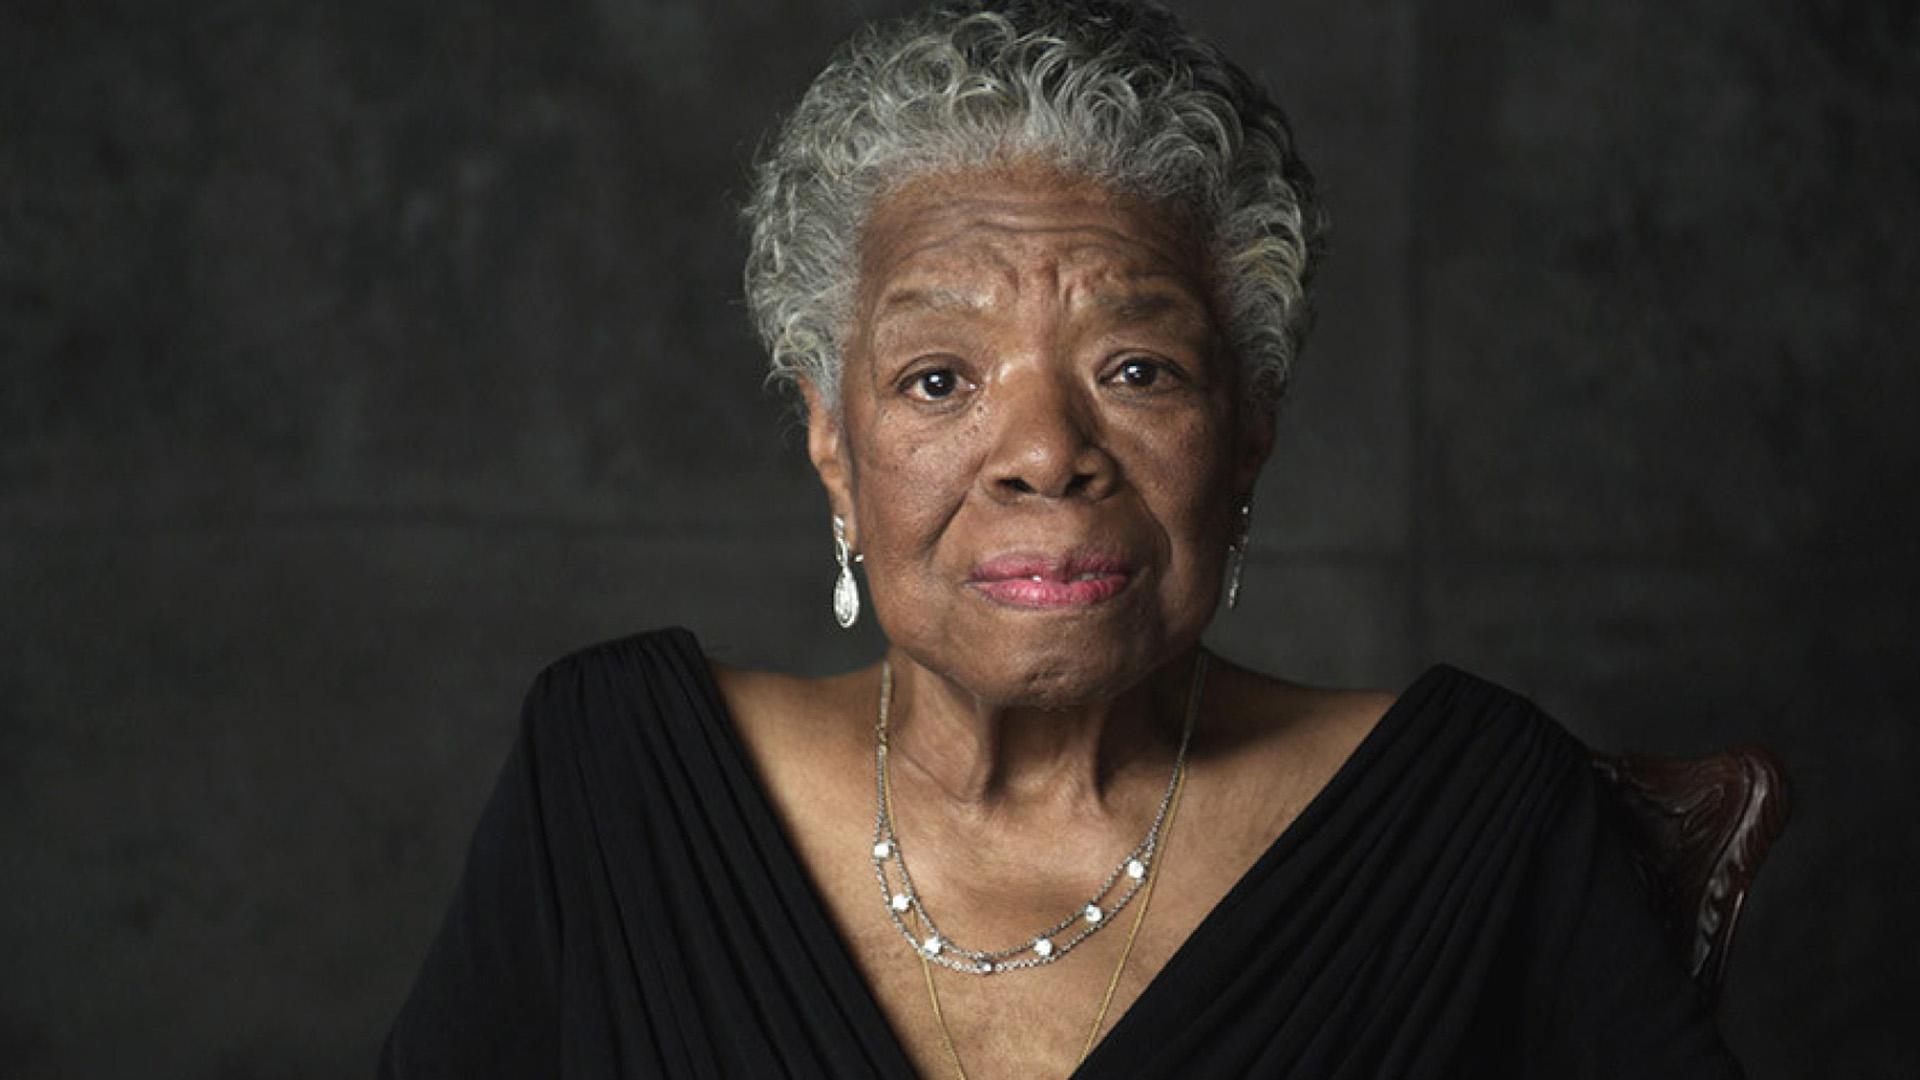 Boundary-pushing poet, activist Angelou celebrated in documentary